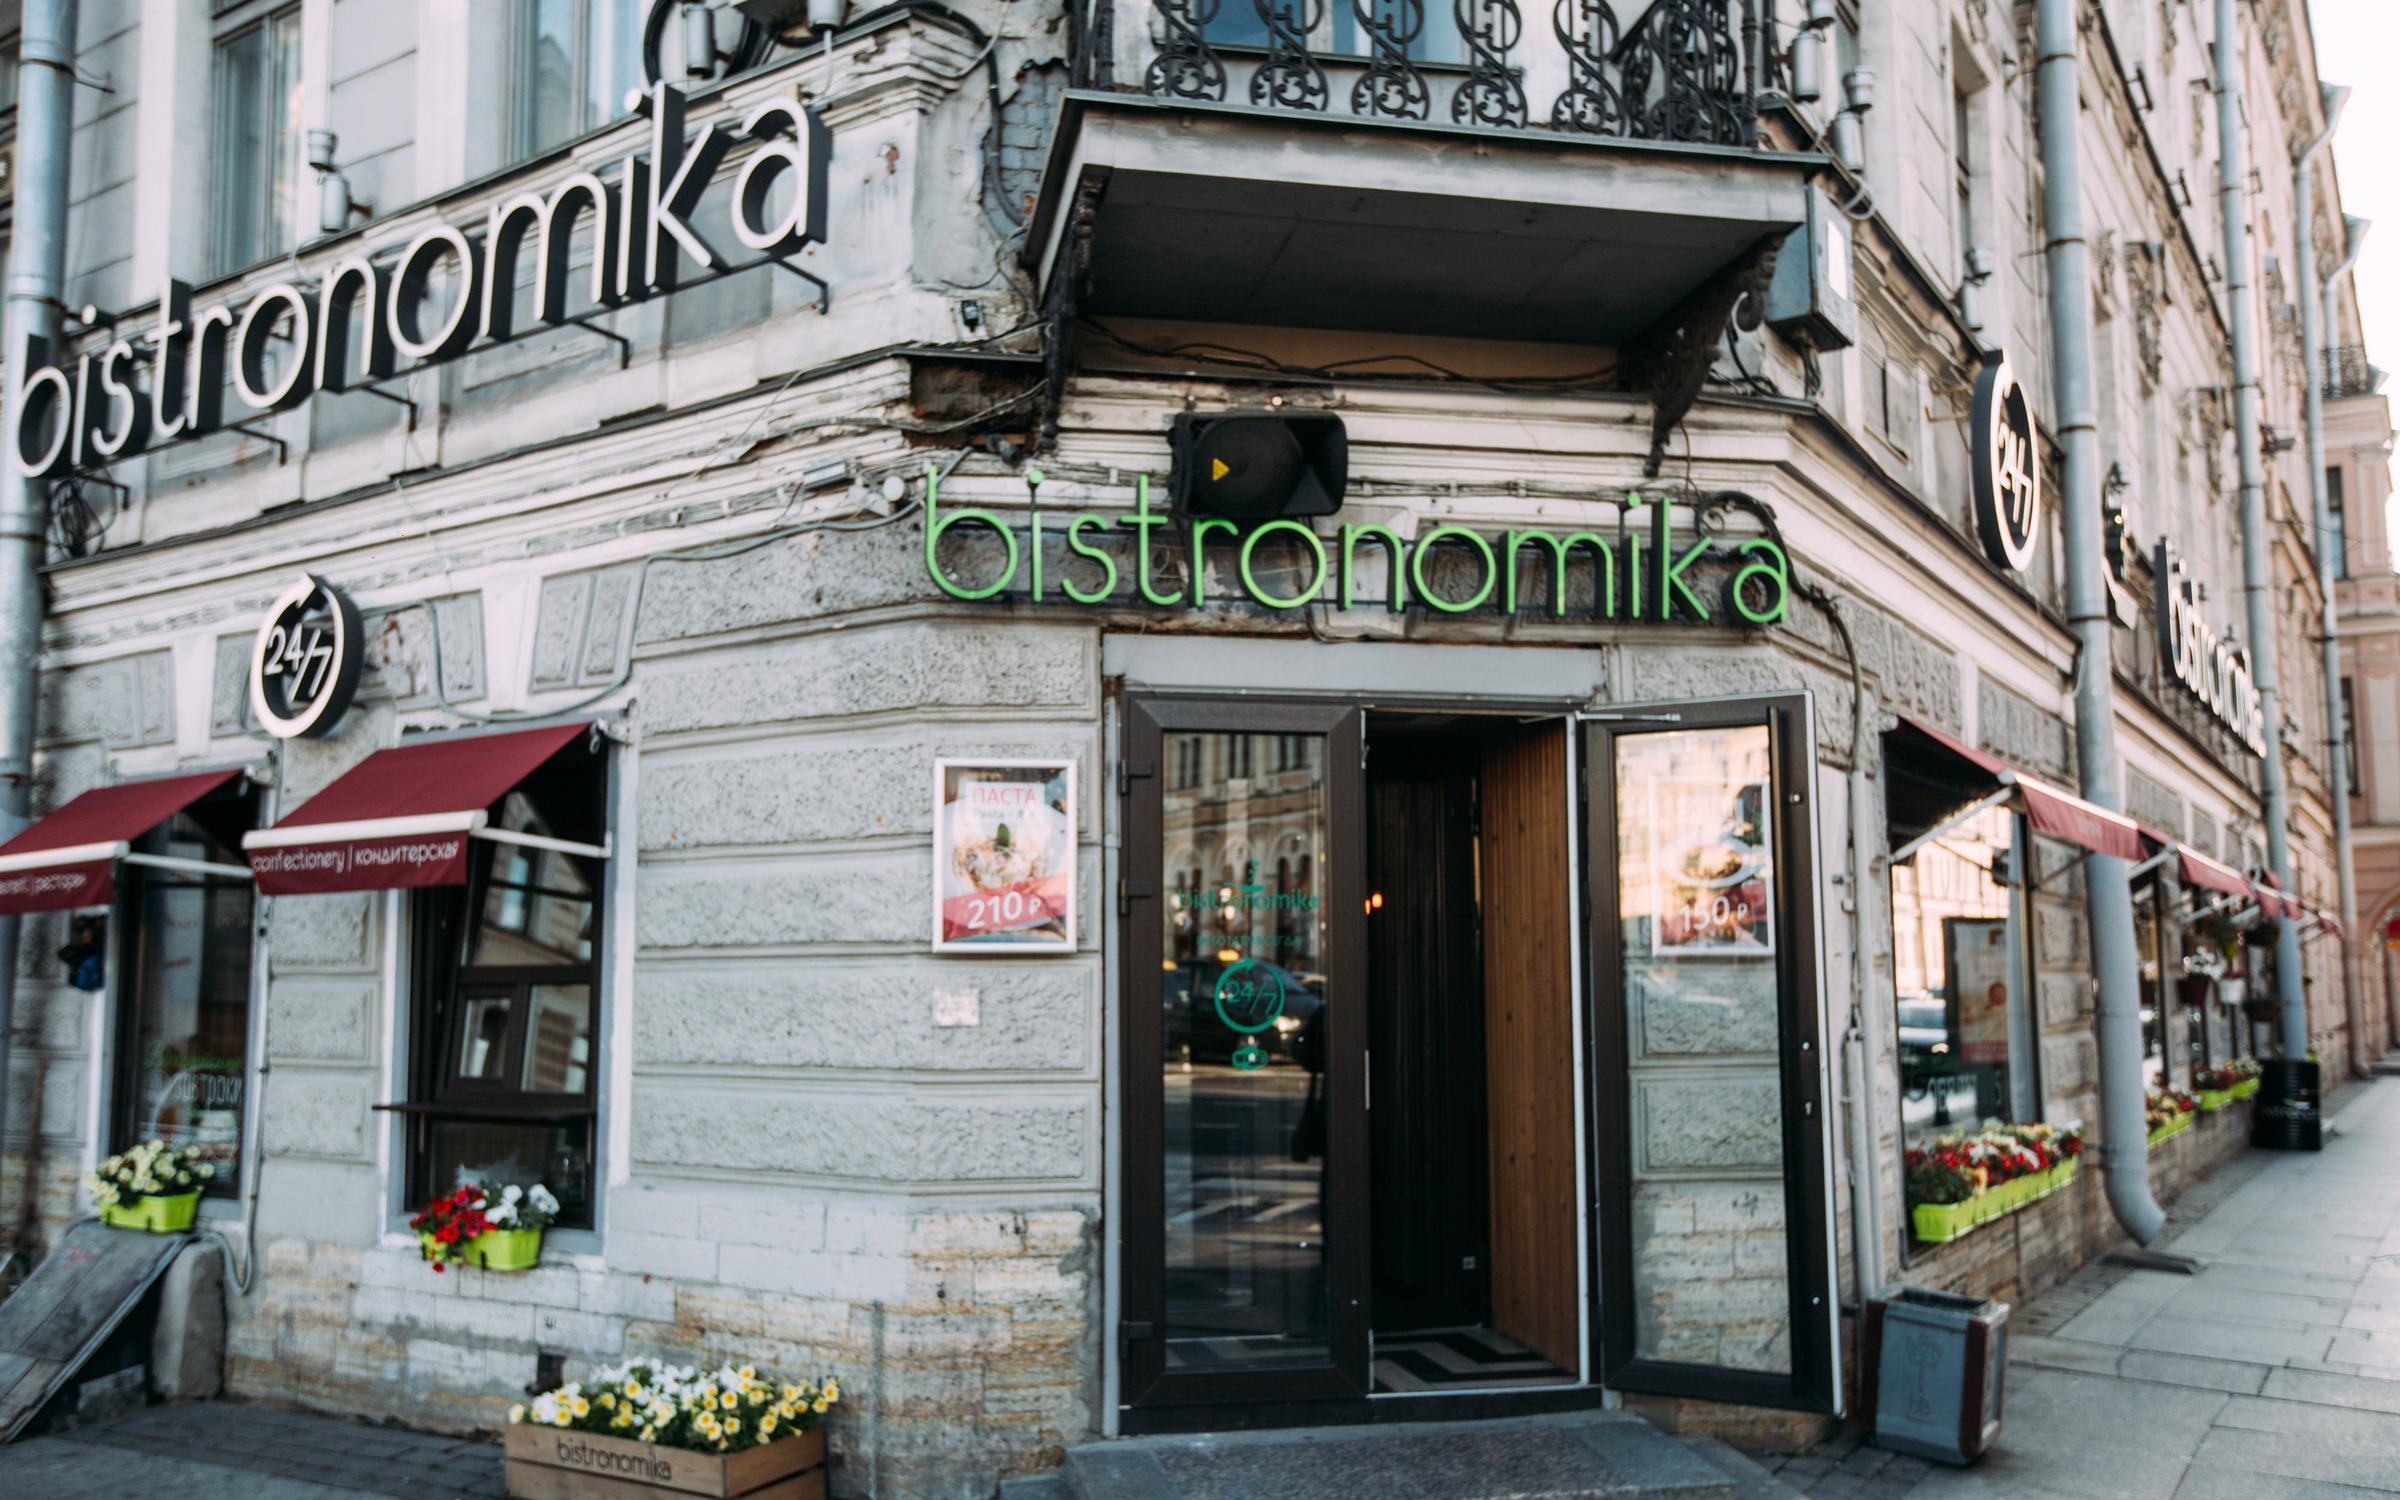 фотография Караоке-ресторана Бистрономика на Невском проспекте